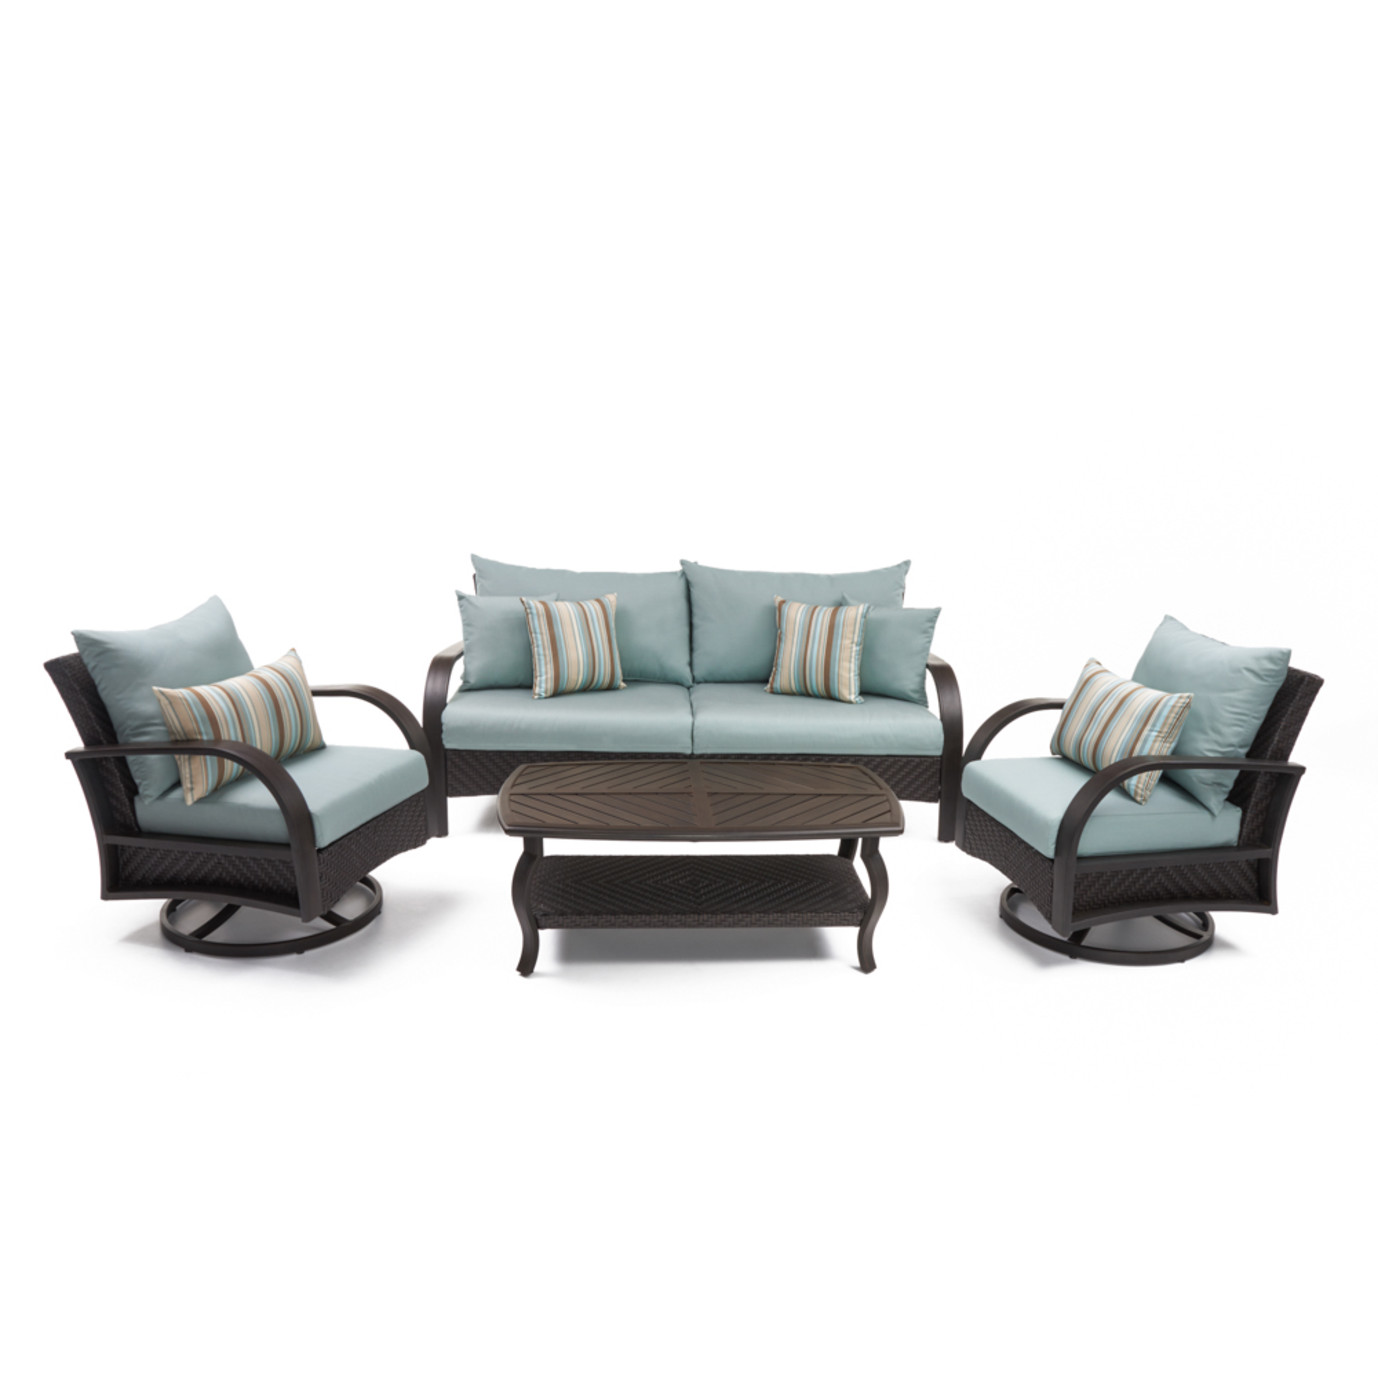 Barcelo™ 4pc Motion Club & Sofa Set - Bliss Blue